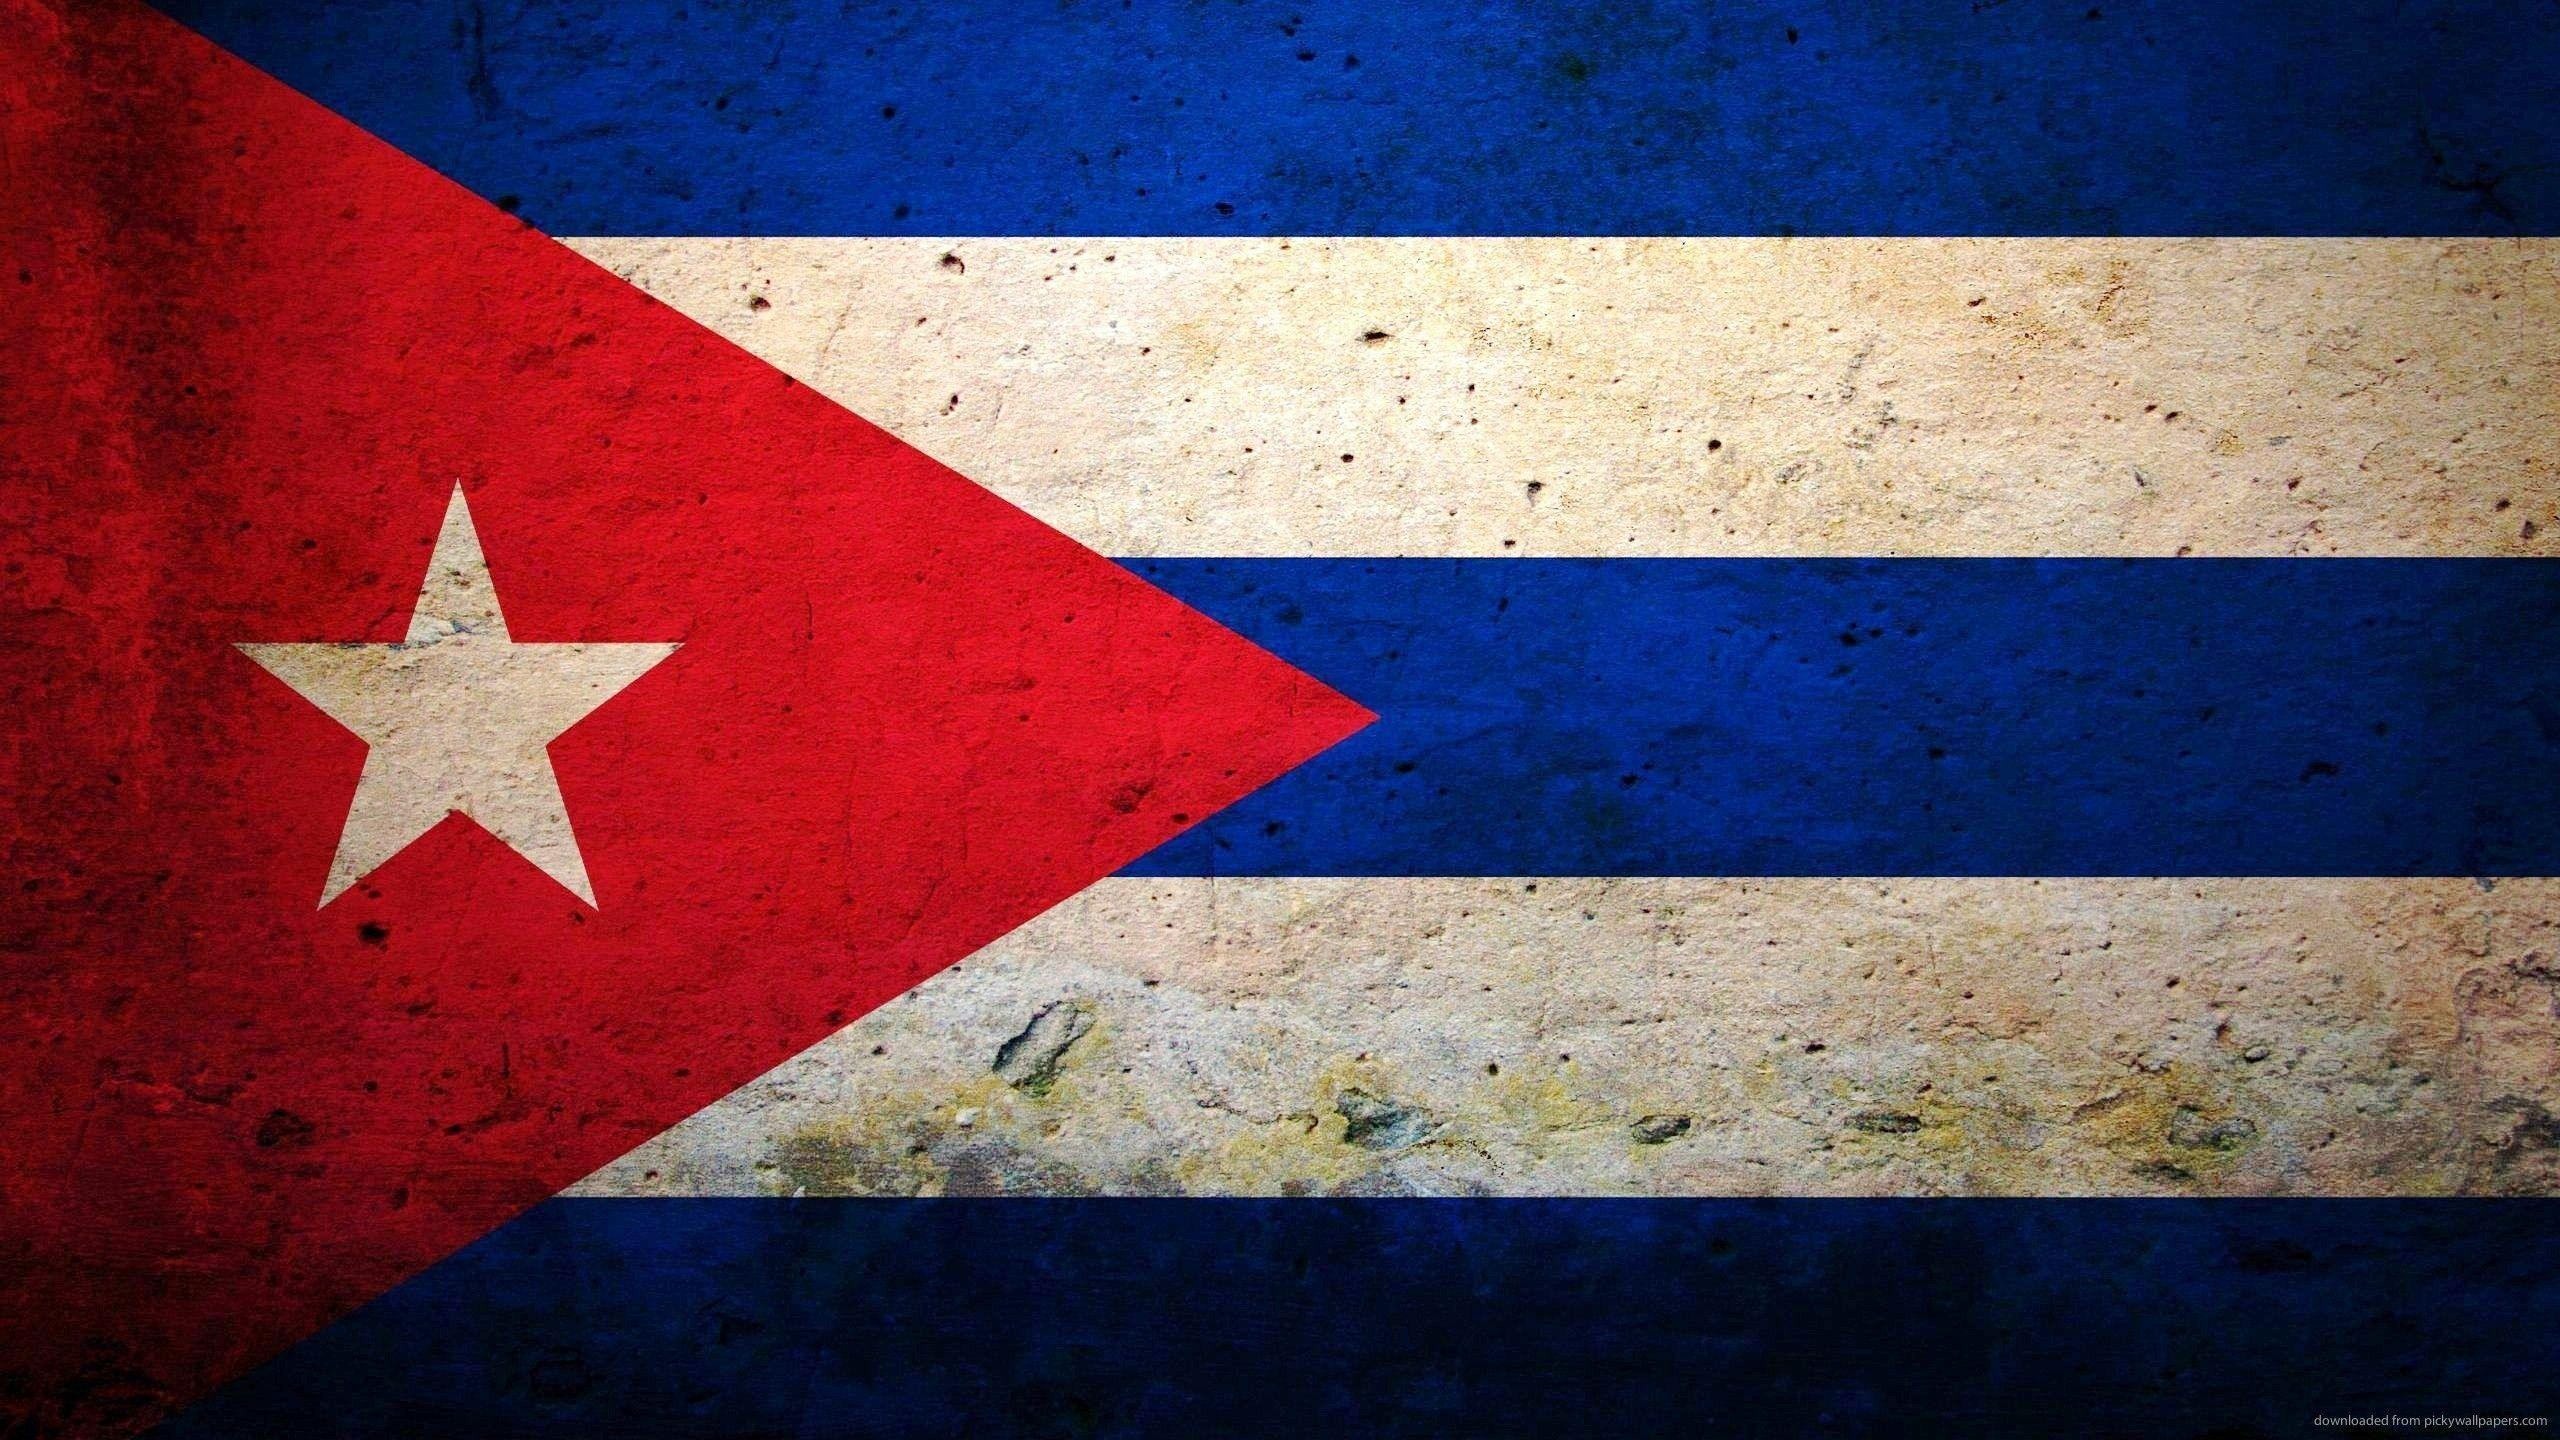 Cuban Wallpapers 2560x1440